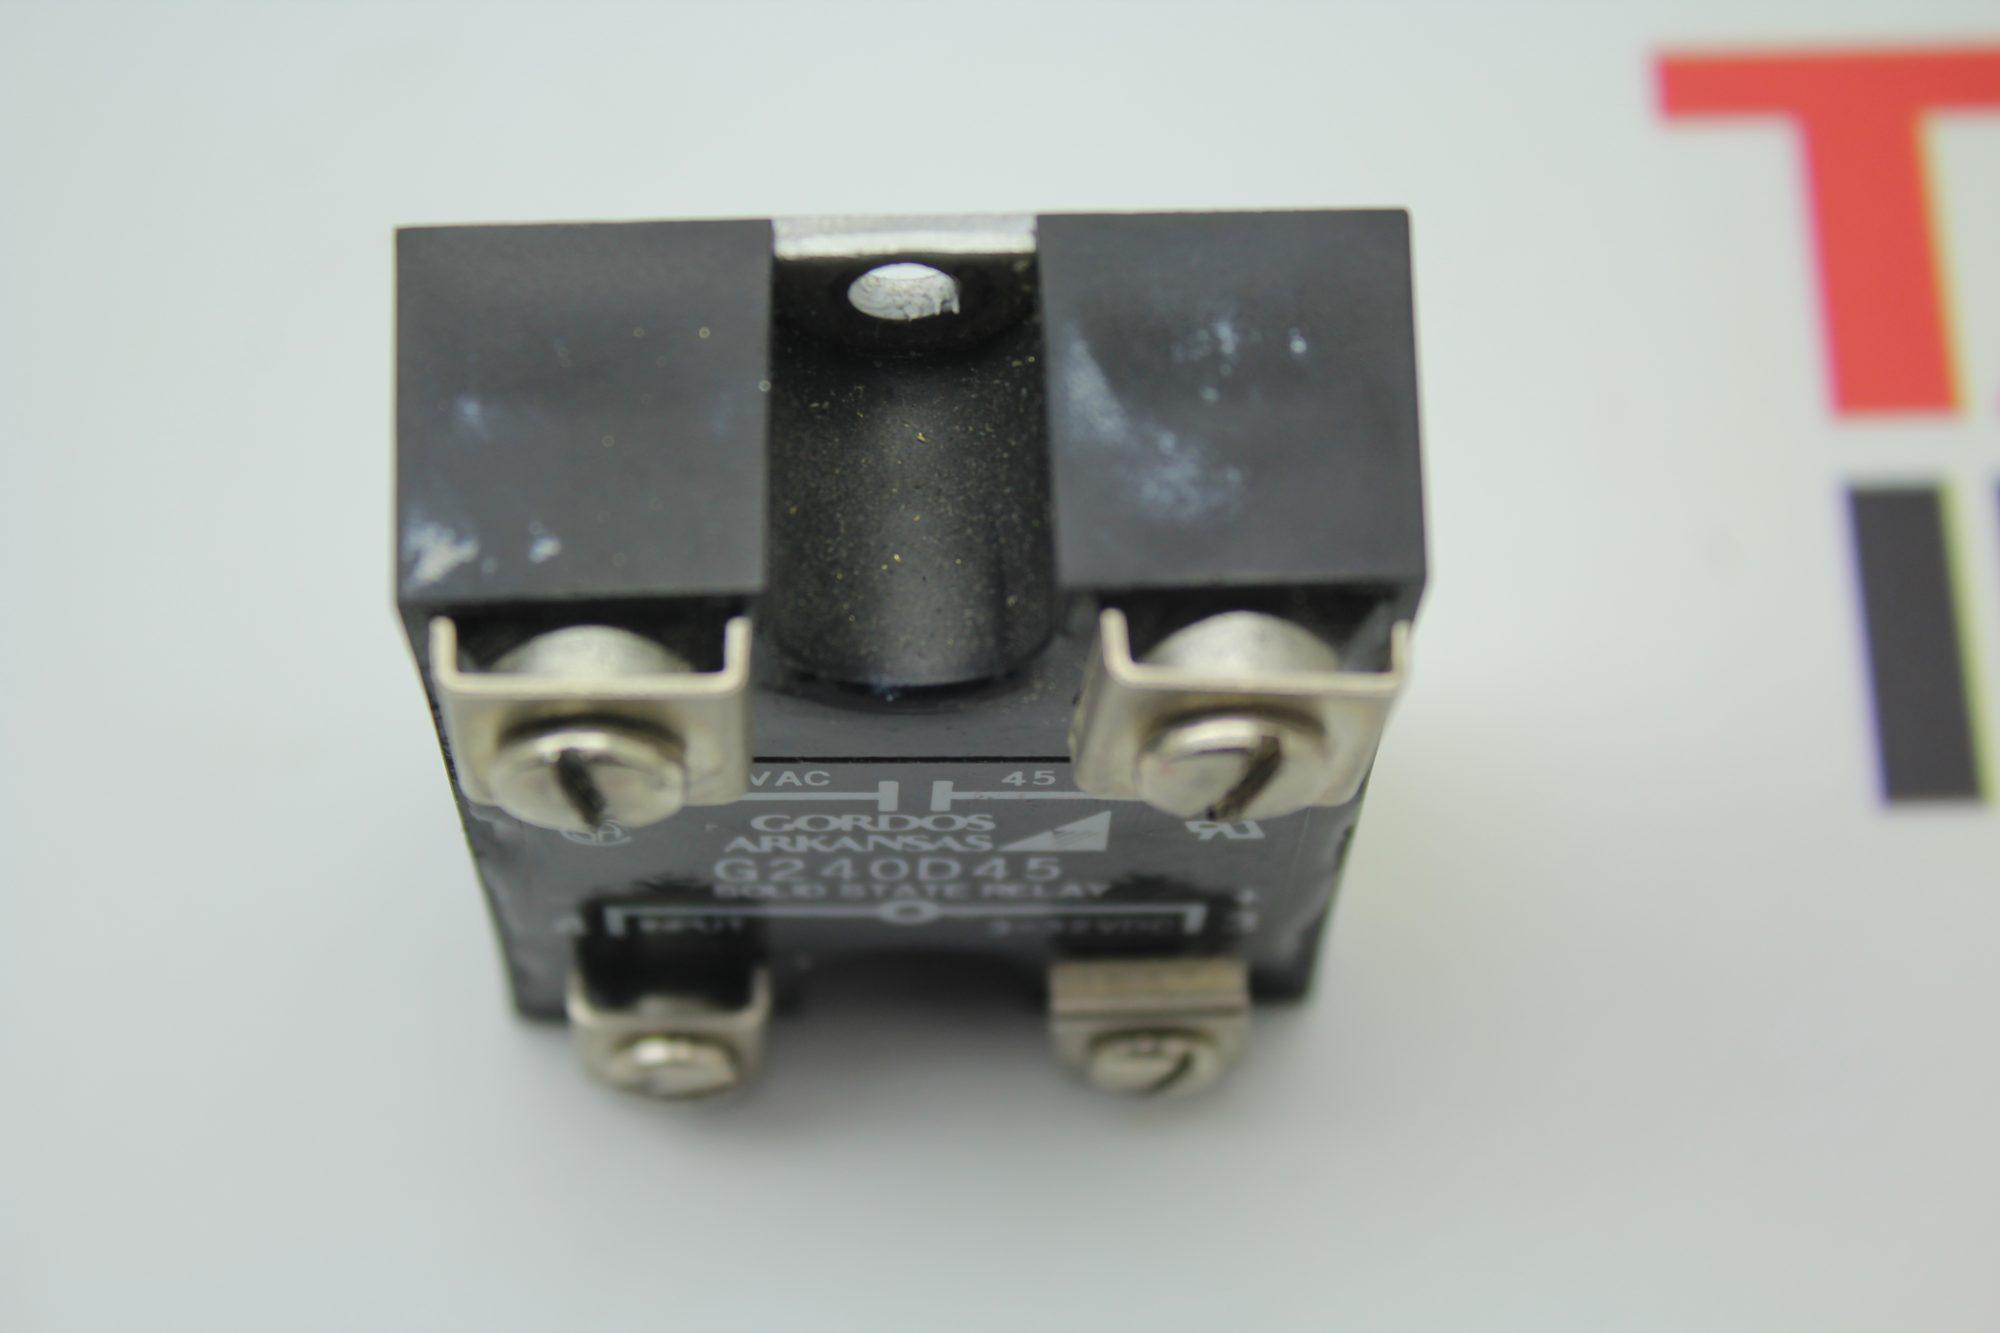 Gordos G240d45 Solid State Relay 240vac 45 Amp 3 32vdc 240v Ac